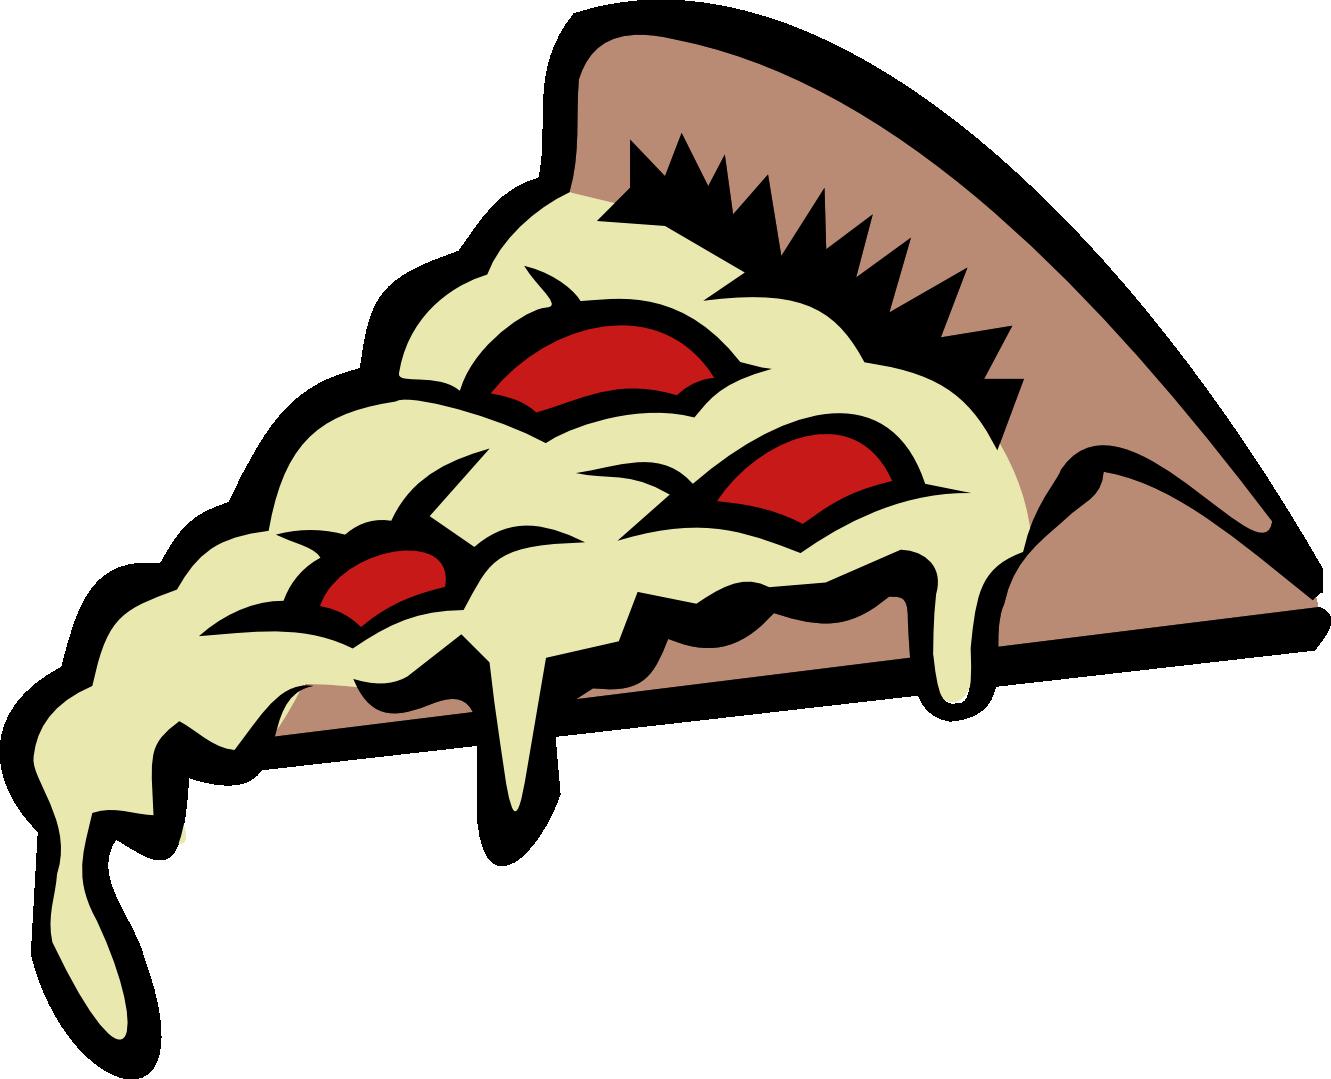 Slice panda free images. Pizza clipart salad